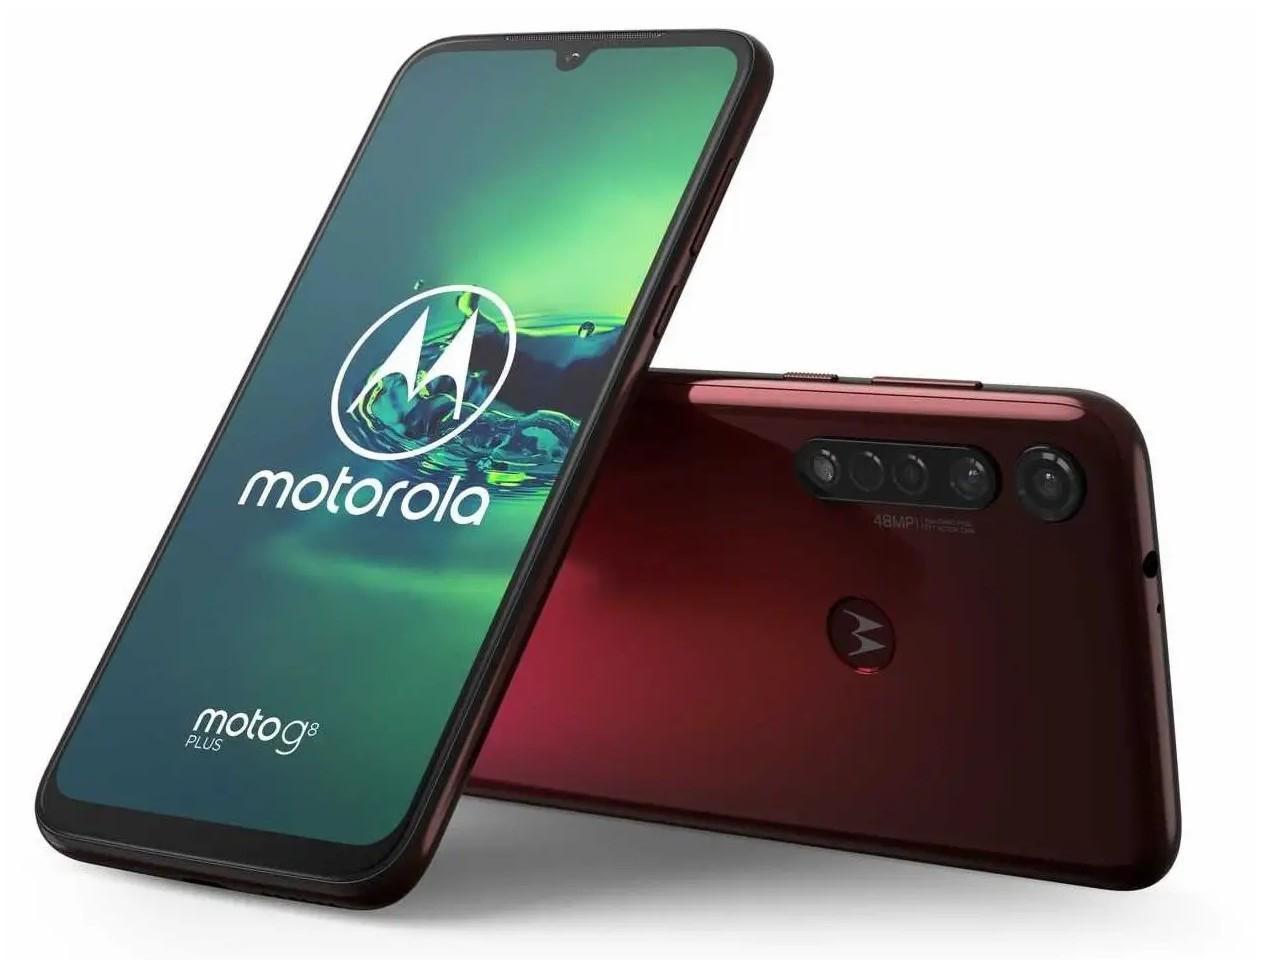 MOTOROLA Moto G8 Plus, 4GB/64GB, Dual SIM, růžový, CZ distribuce